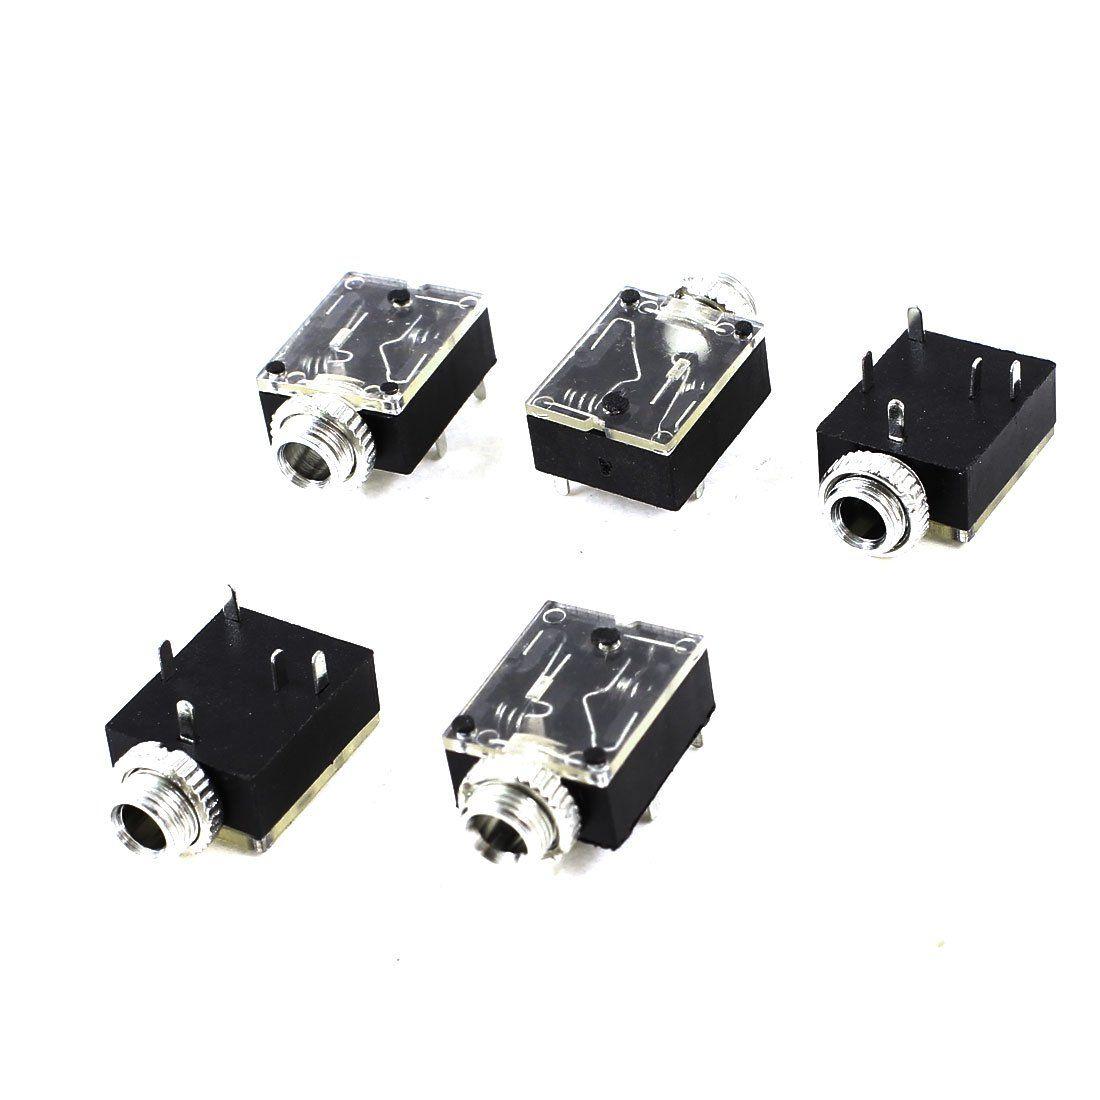 IMC Hot 5 Stücke 5 Pin 3,5mm Audio Mono Jack Socket PCB Plattenmontage für Kopfhörer